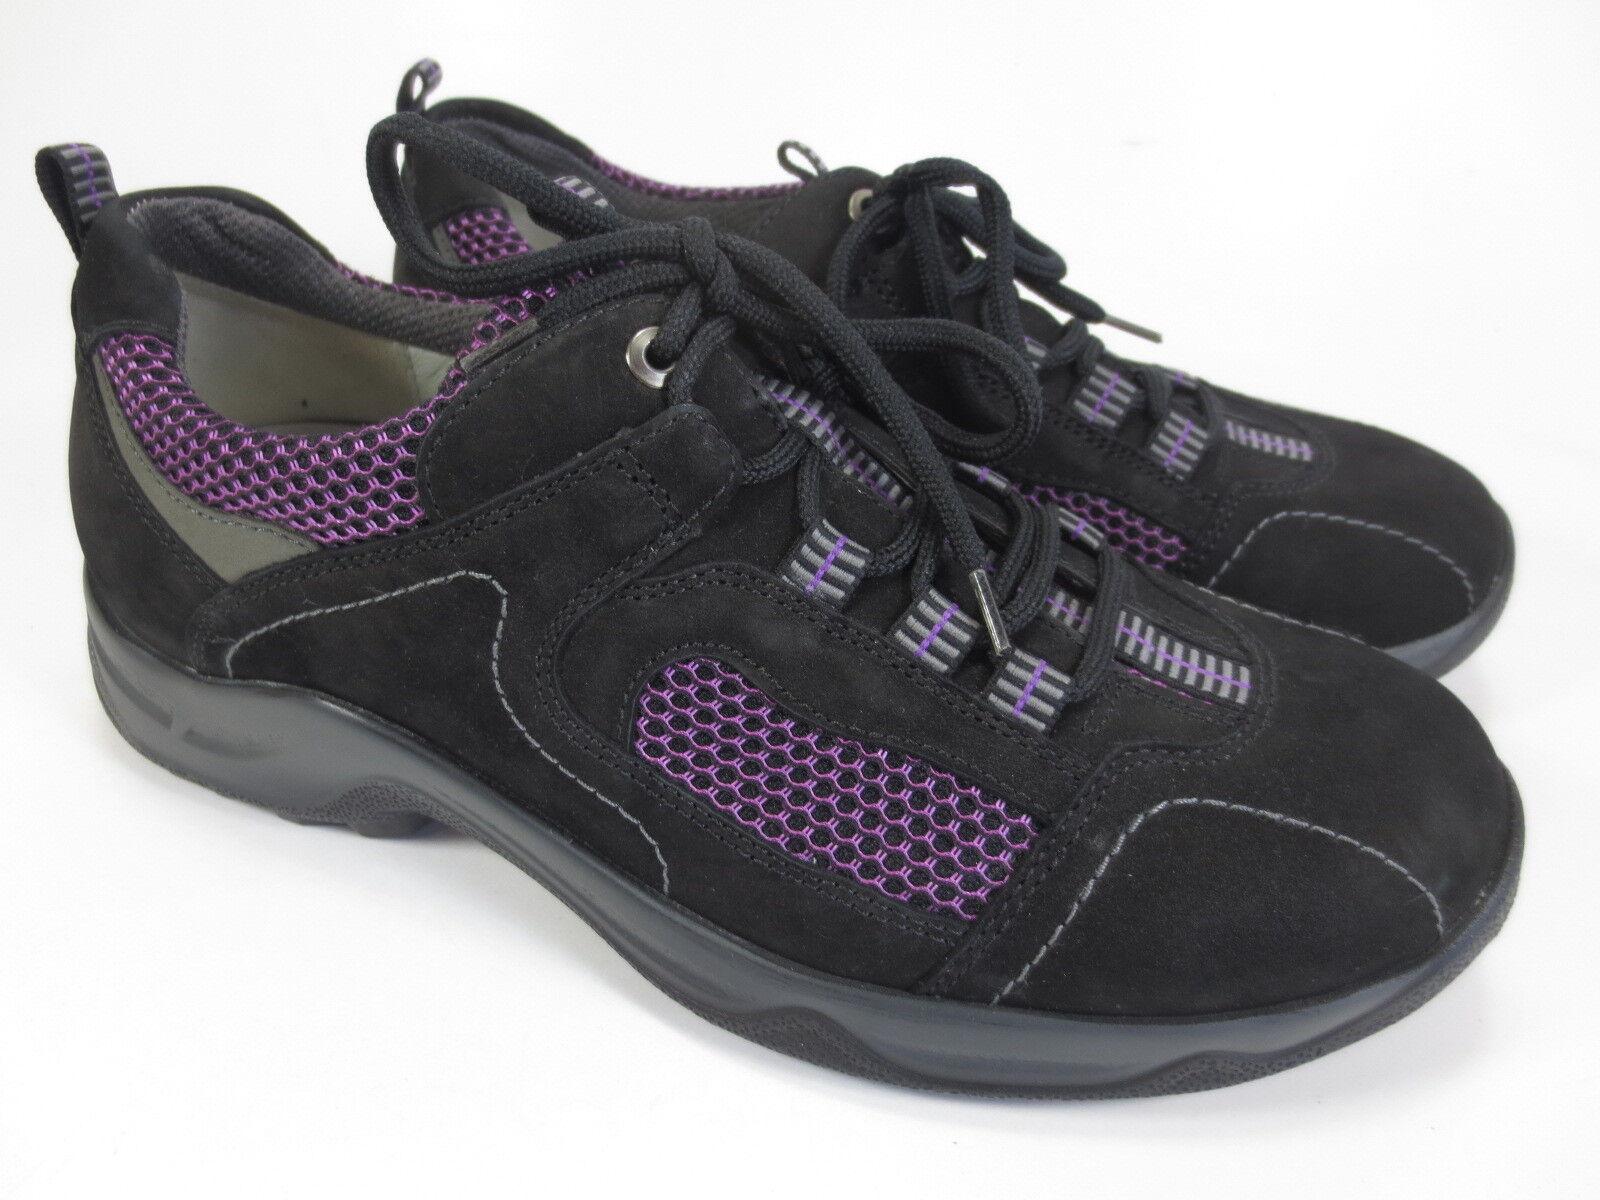 WALDLÄUFER Hadel Komfort Leder Schuhe Halbschuhe Gr. 37,5 UK 4,5 H  074 lila